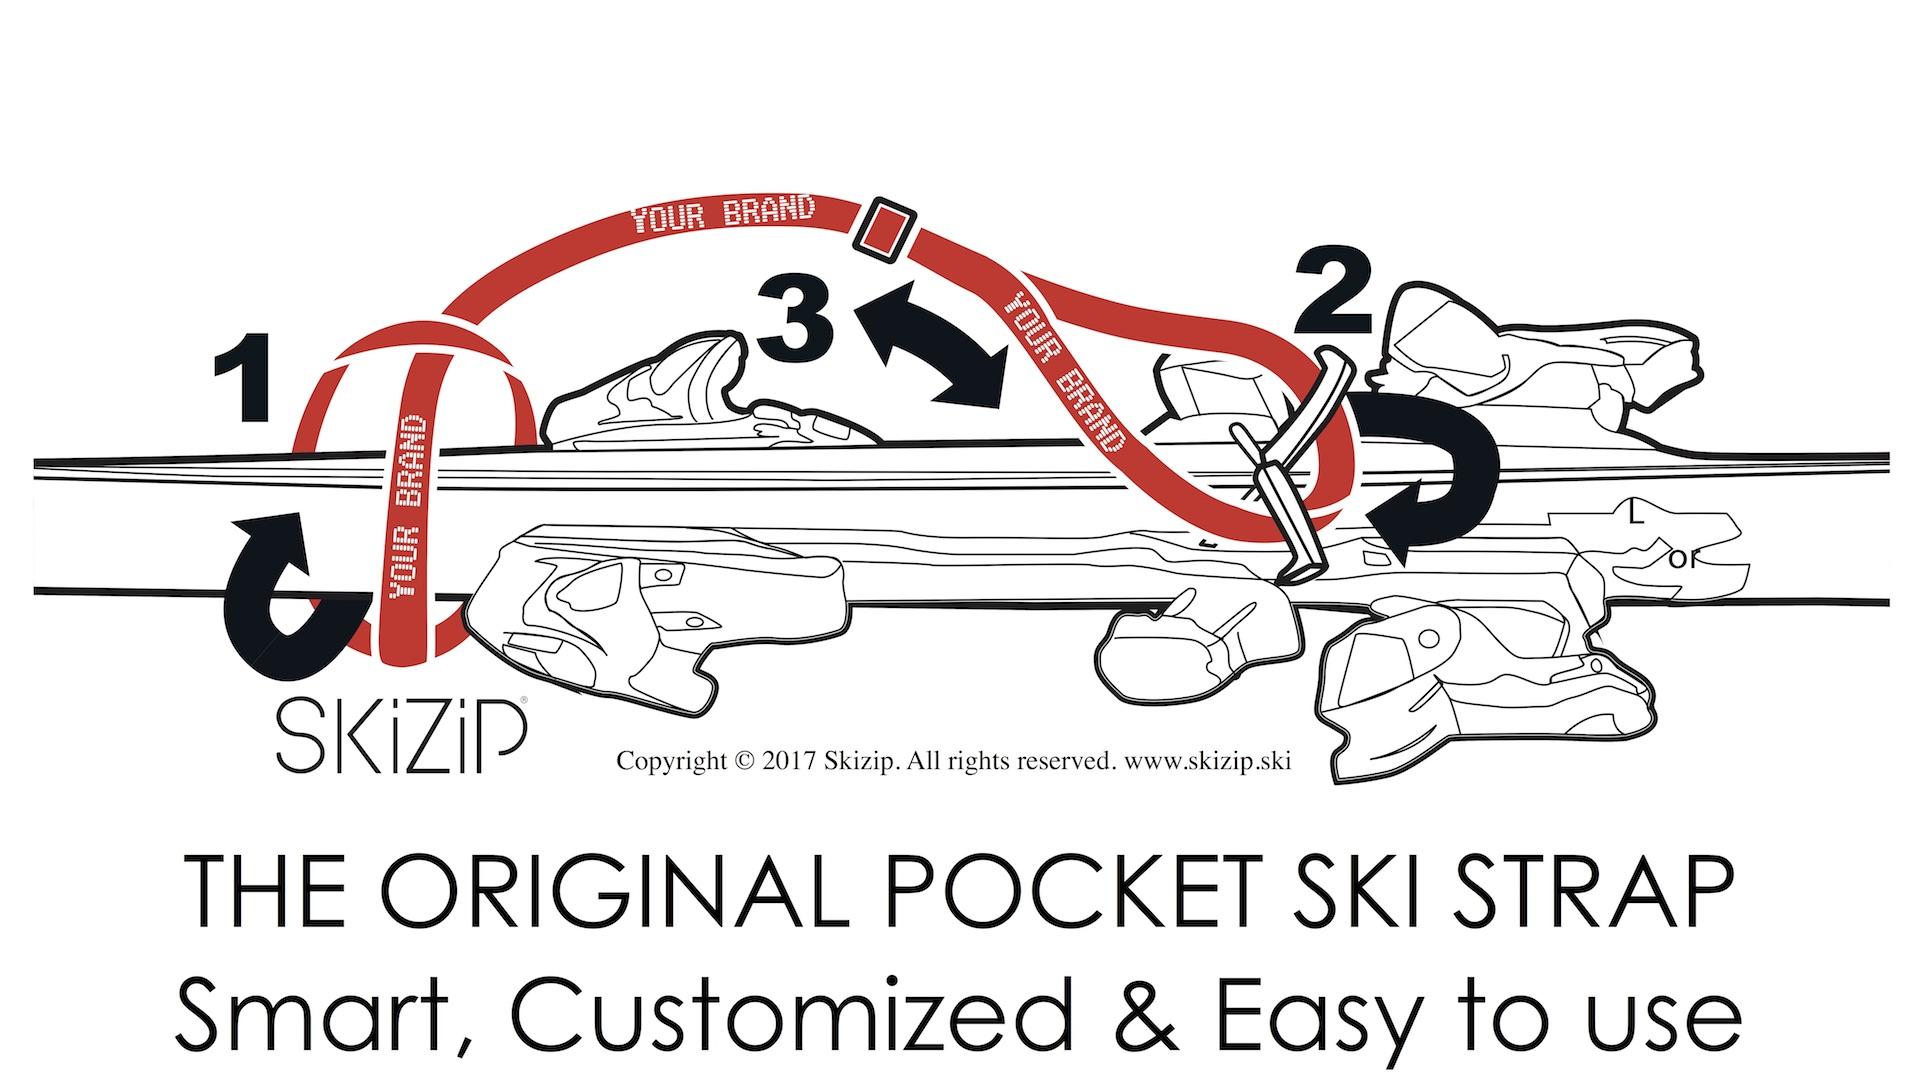 Skizip Pocket esqu/í Strap